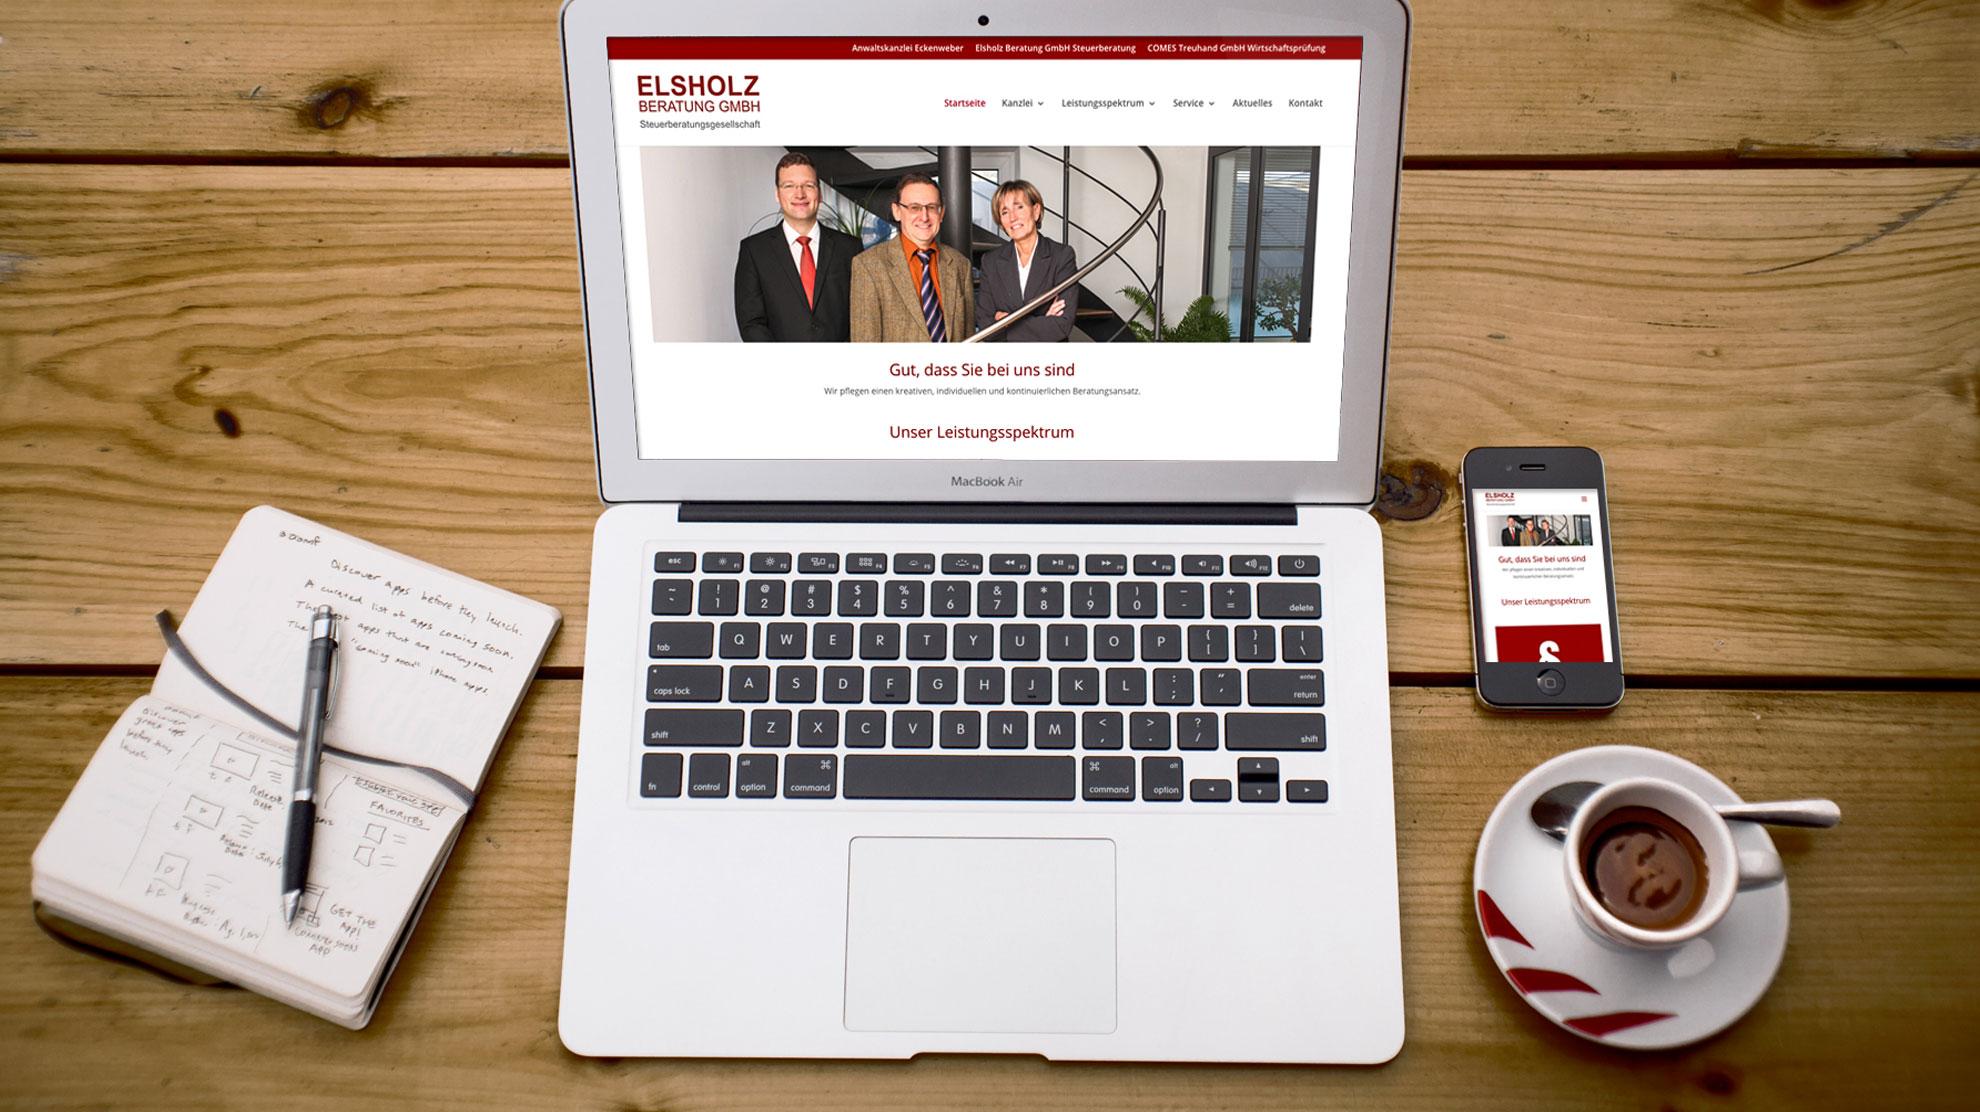 Webseite der Steuerberatung Elsholz GmbH